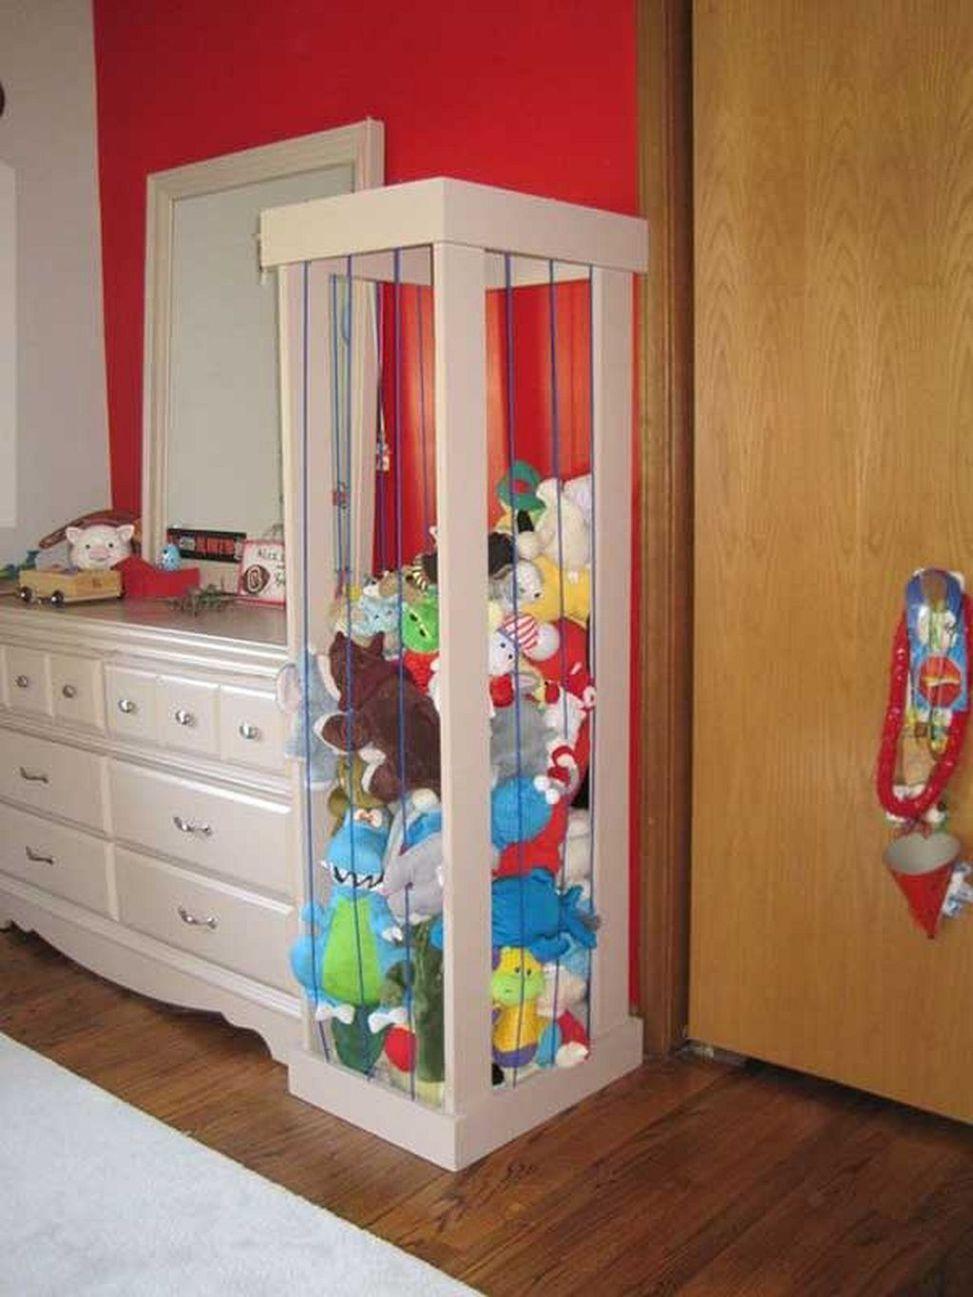 Clever DIY Ways To Organize Kids Stuffed Toys 24 Stuffed